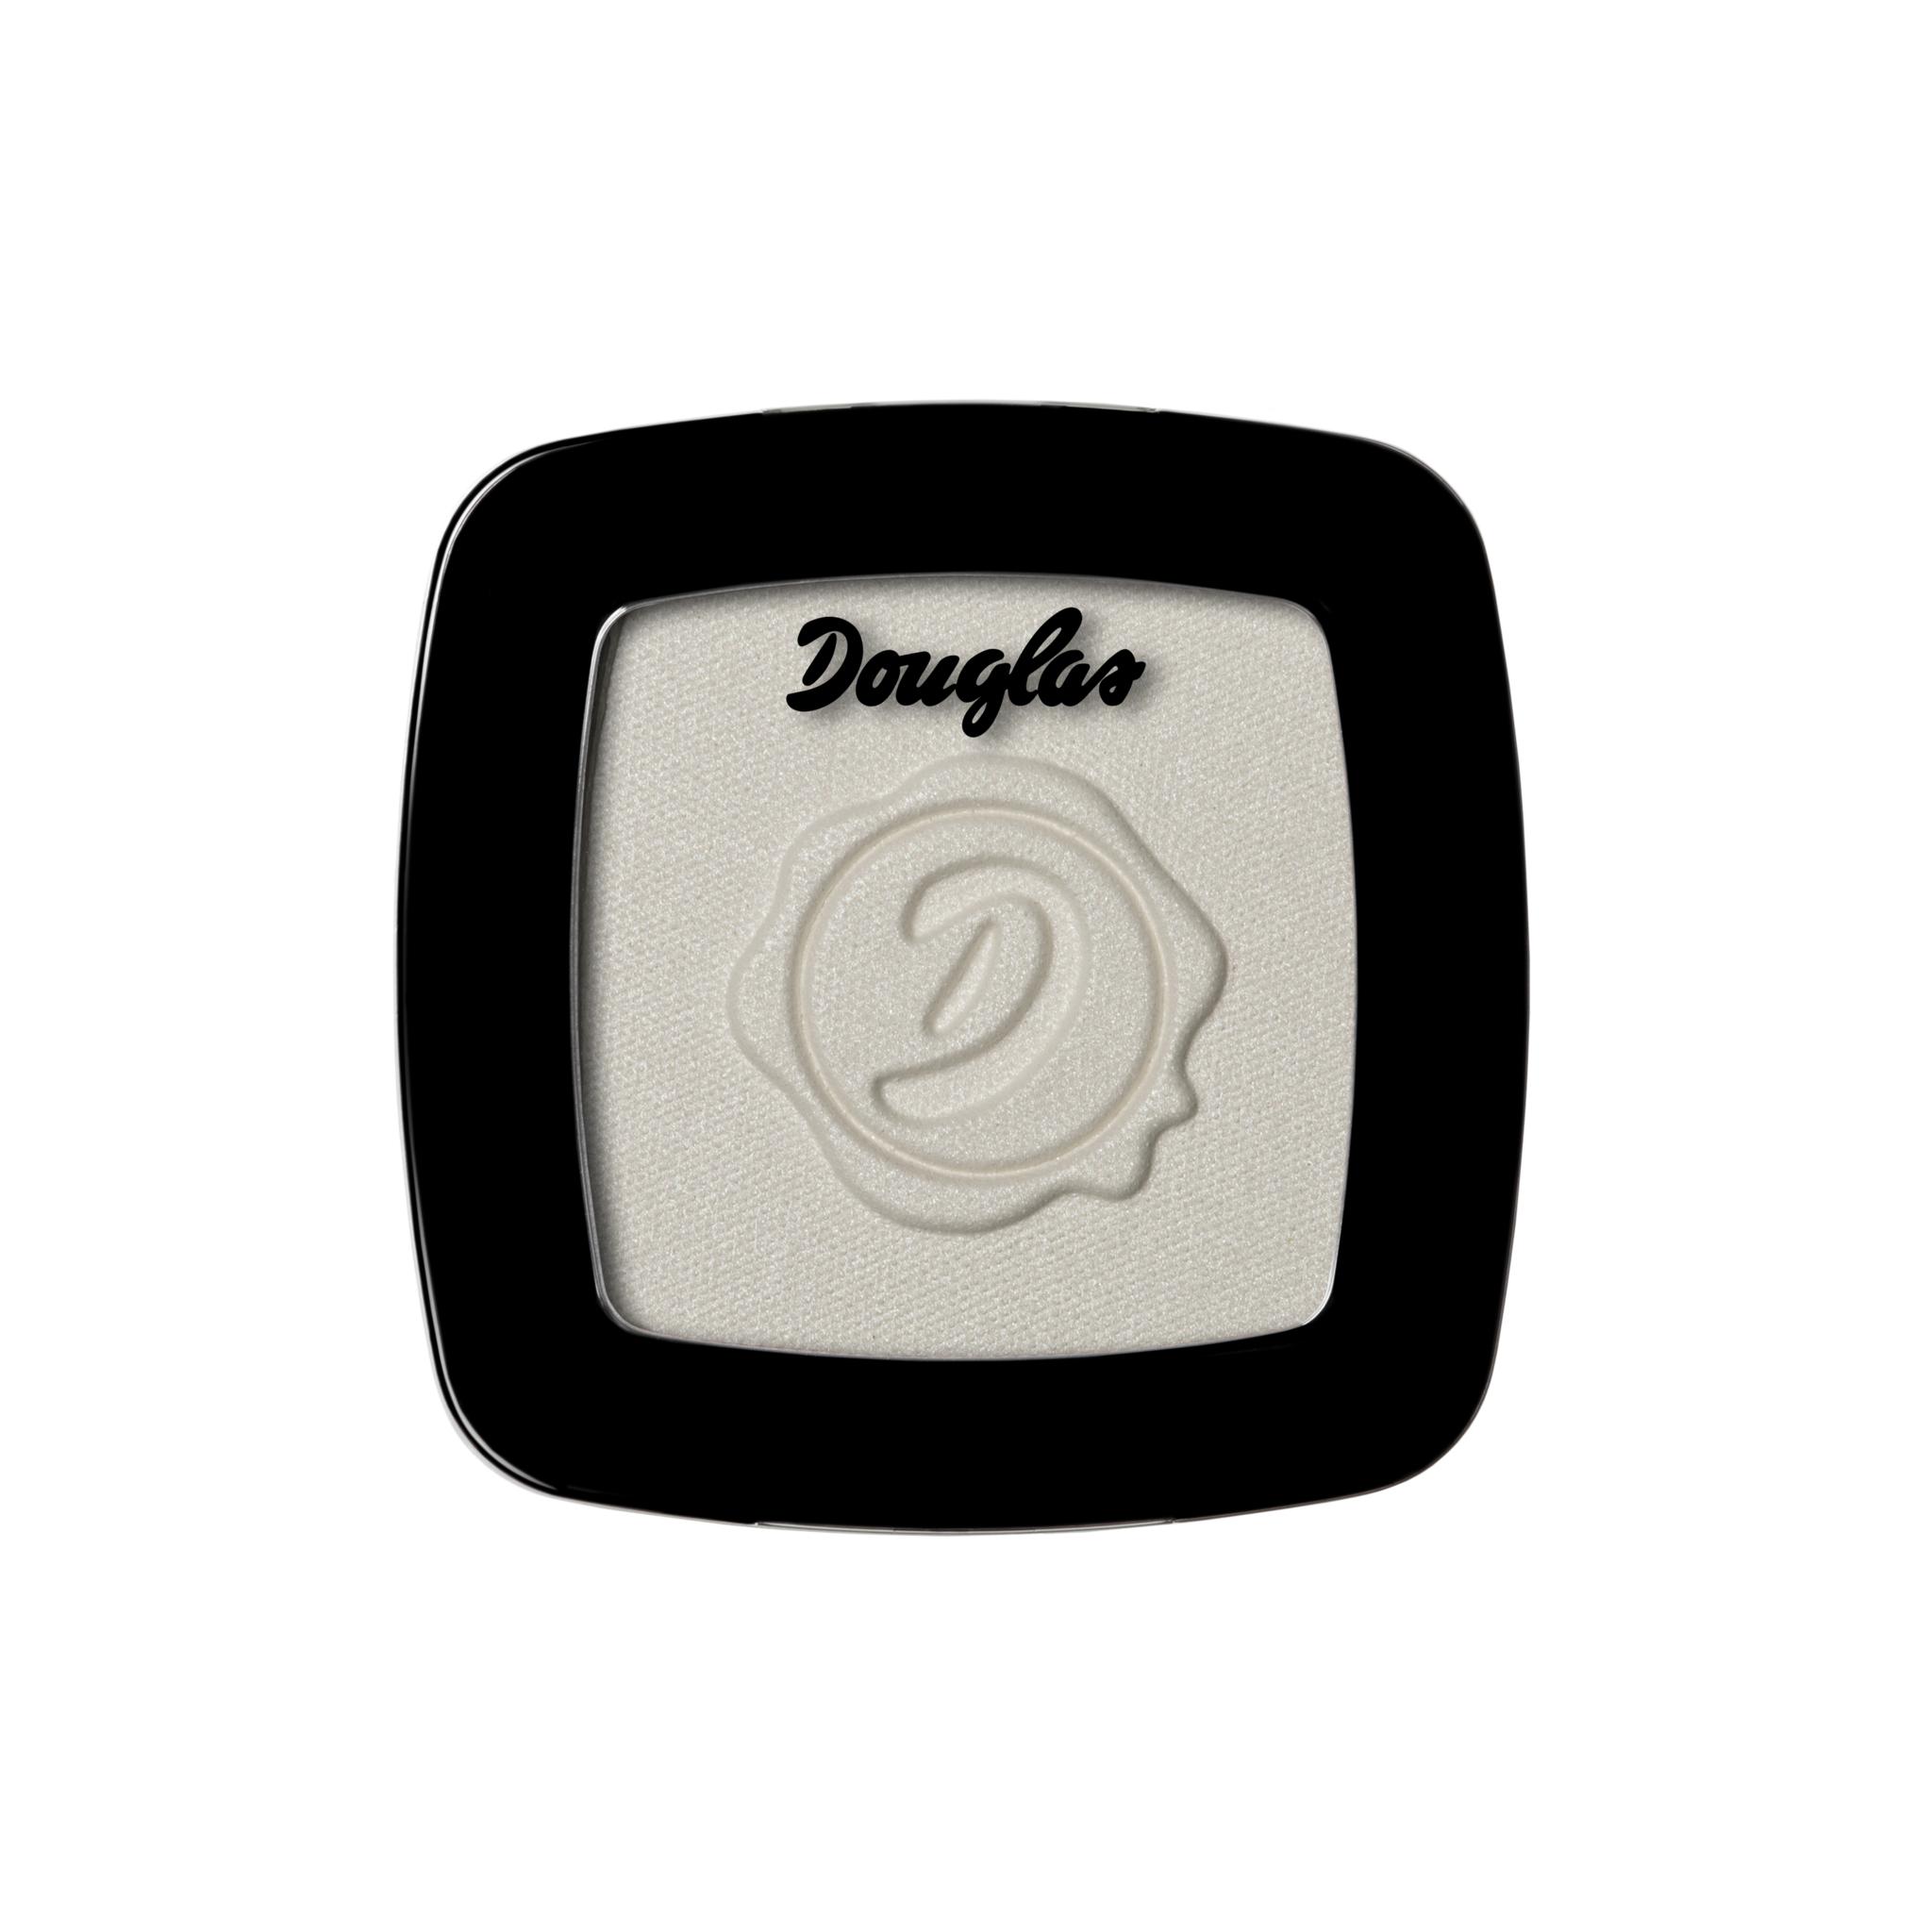 Sombra de ojos color blanco de Douglas (9,90 euros).